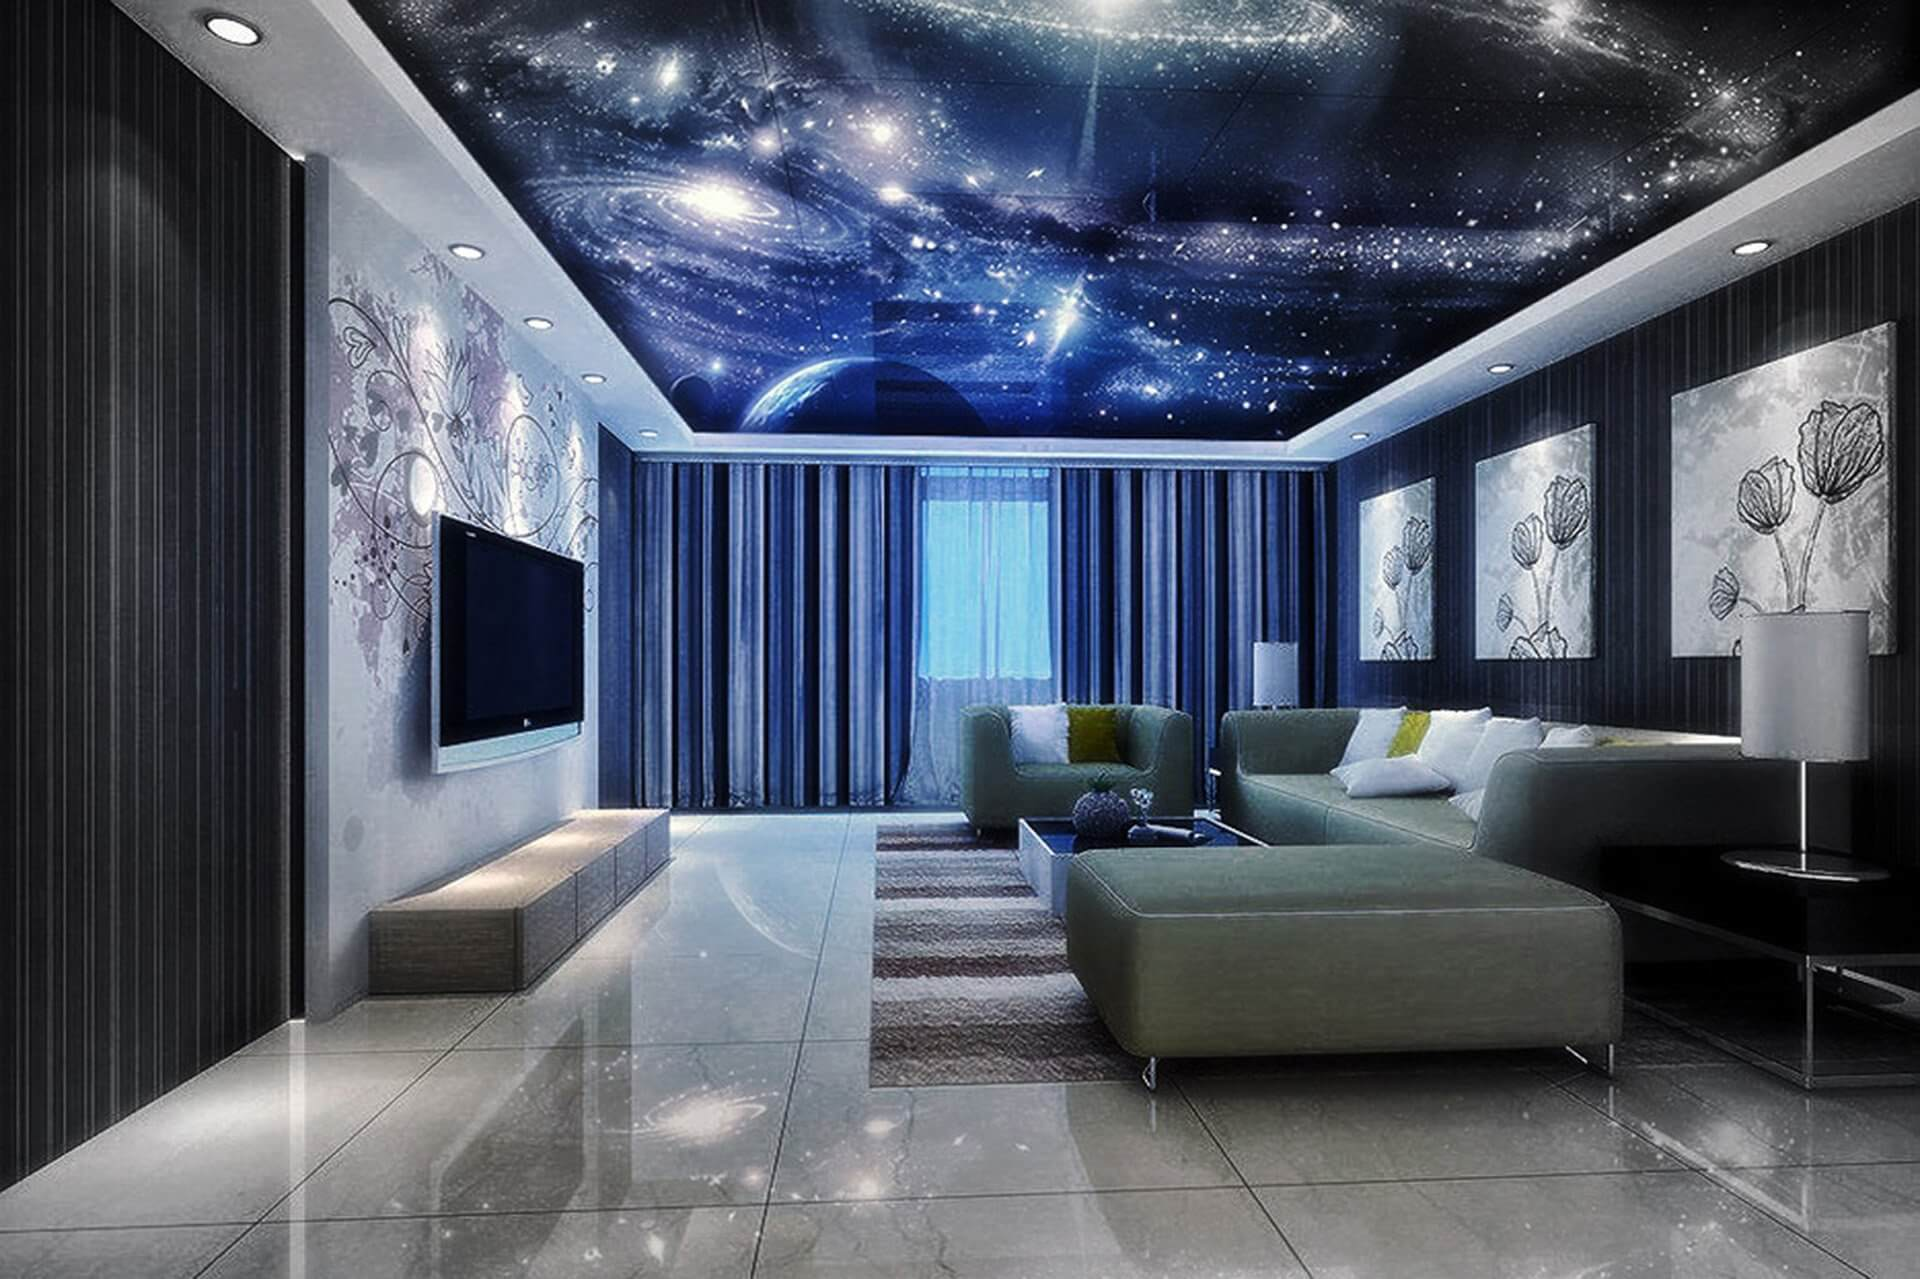 Потолок «Звездное небо»